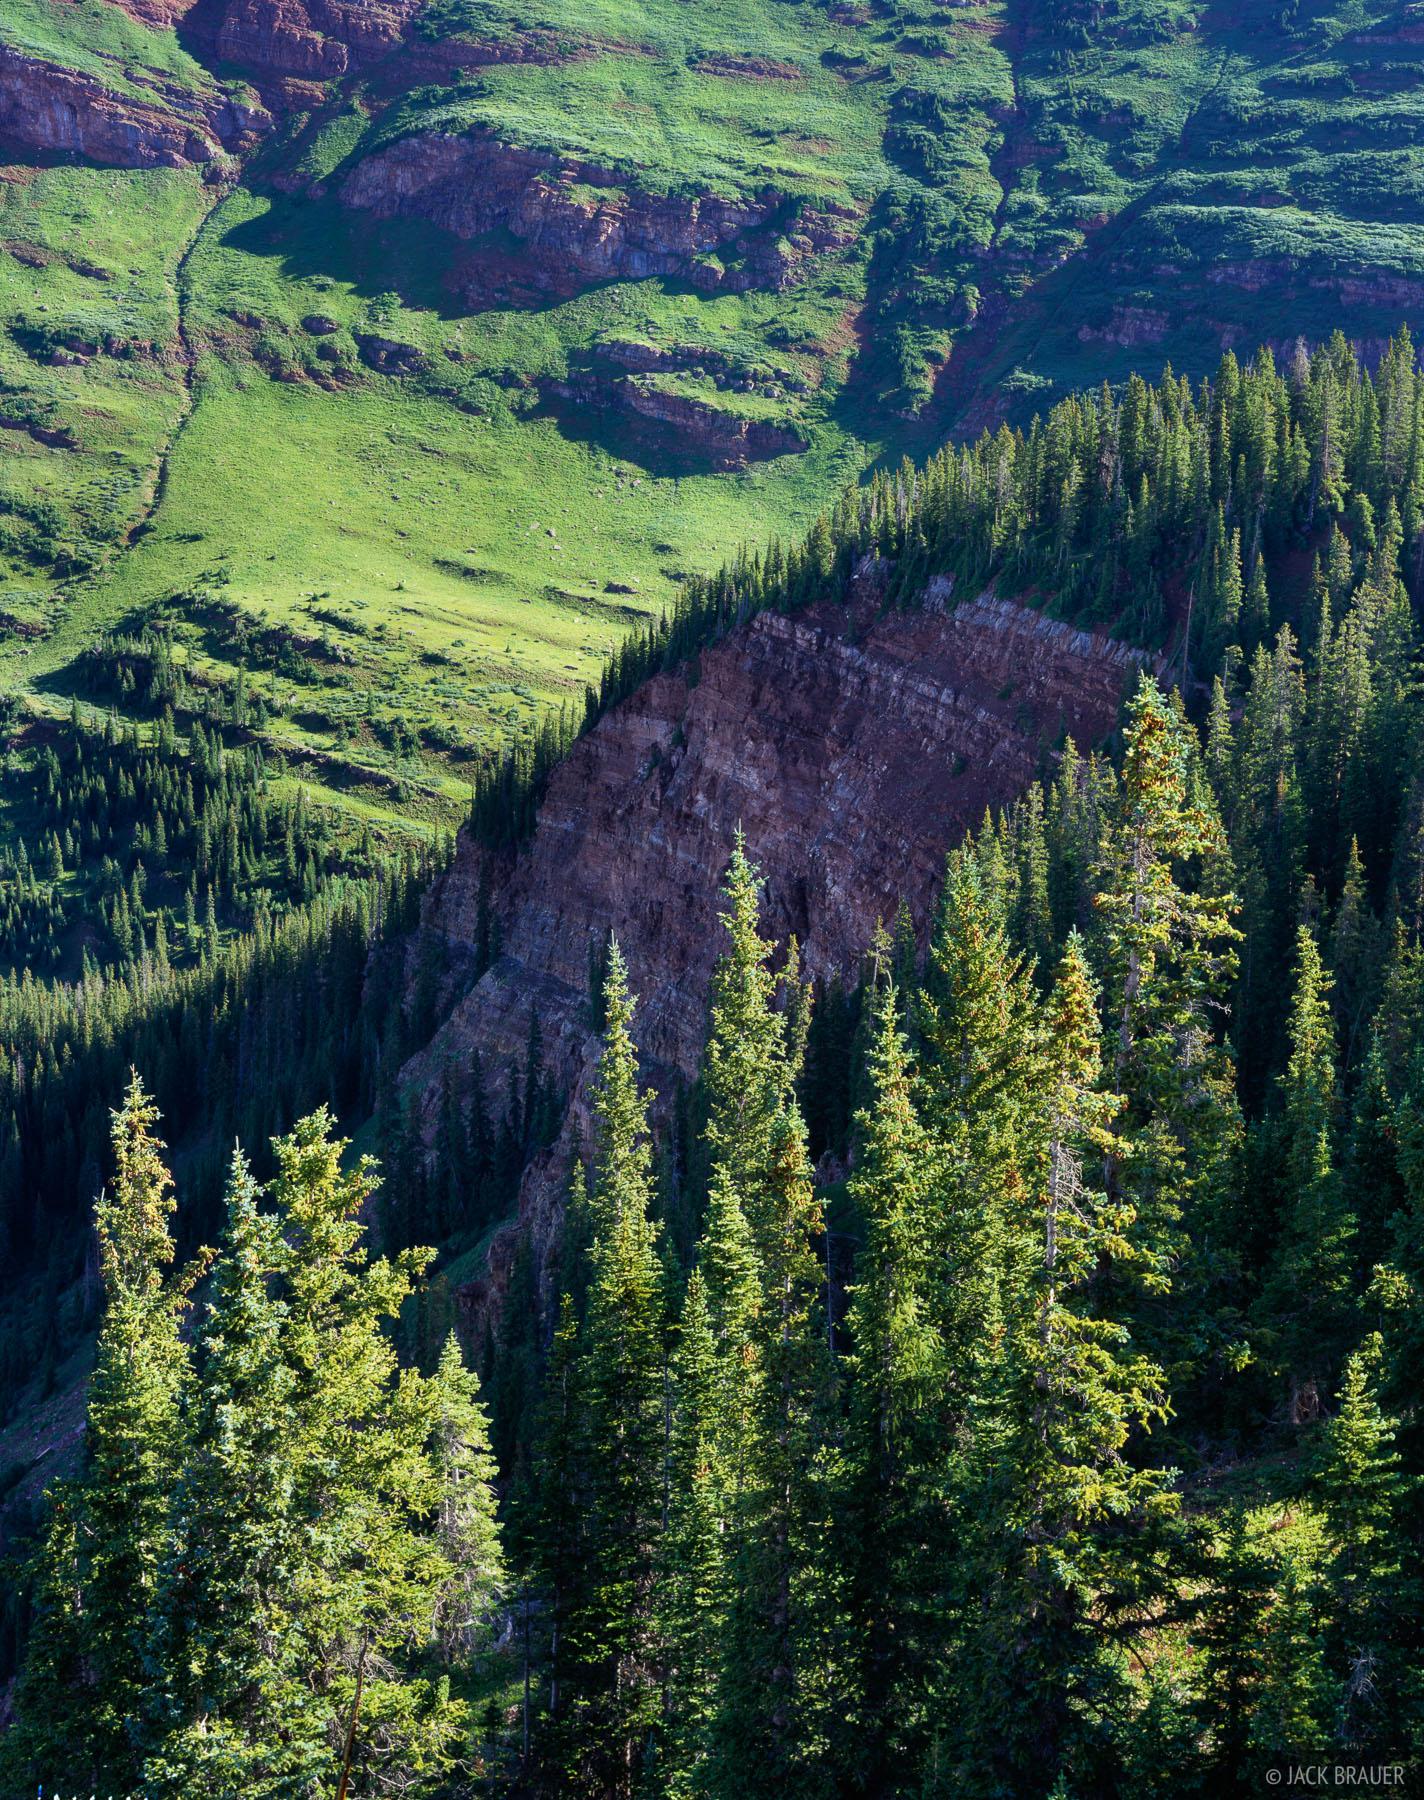 Pine forest, Elk Mountains, Colorado, Maroon Bells-Snowmass Wilderness, photo